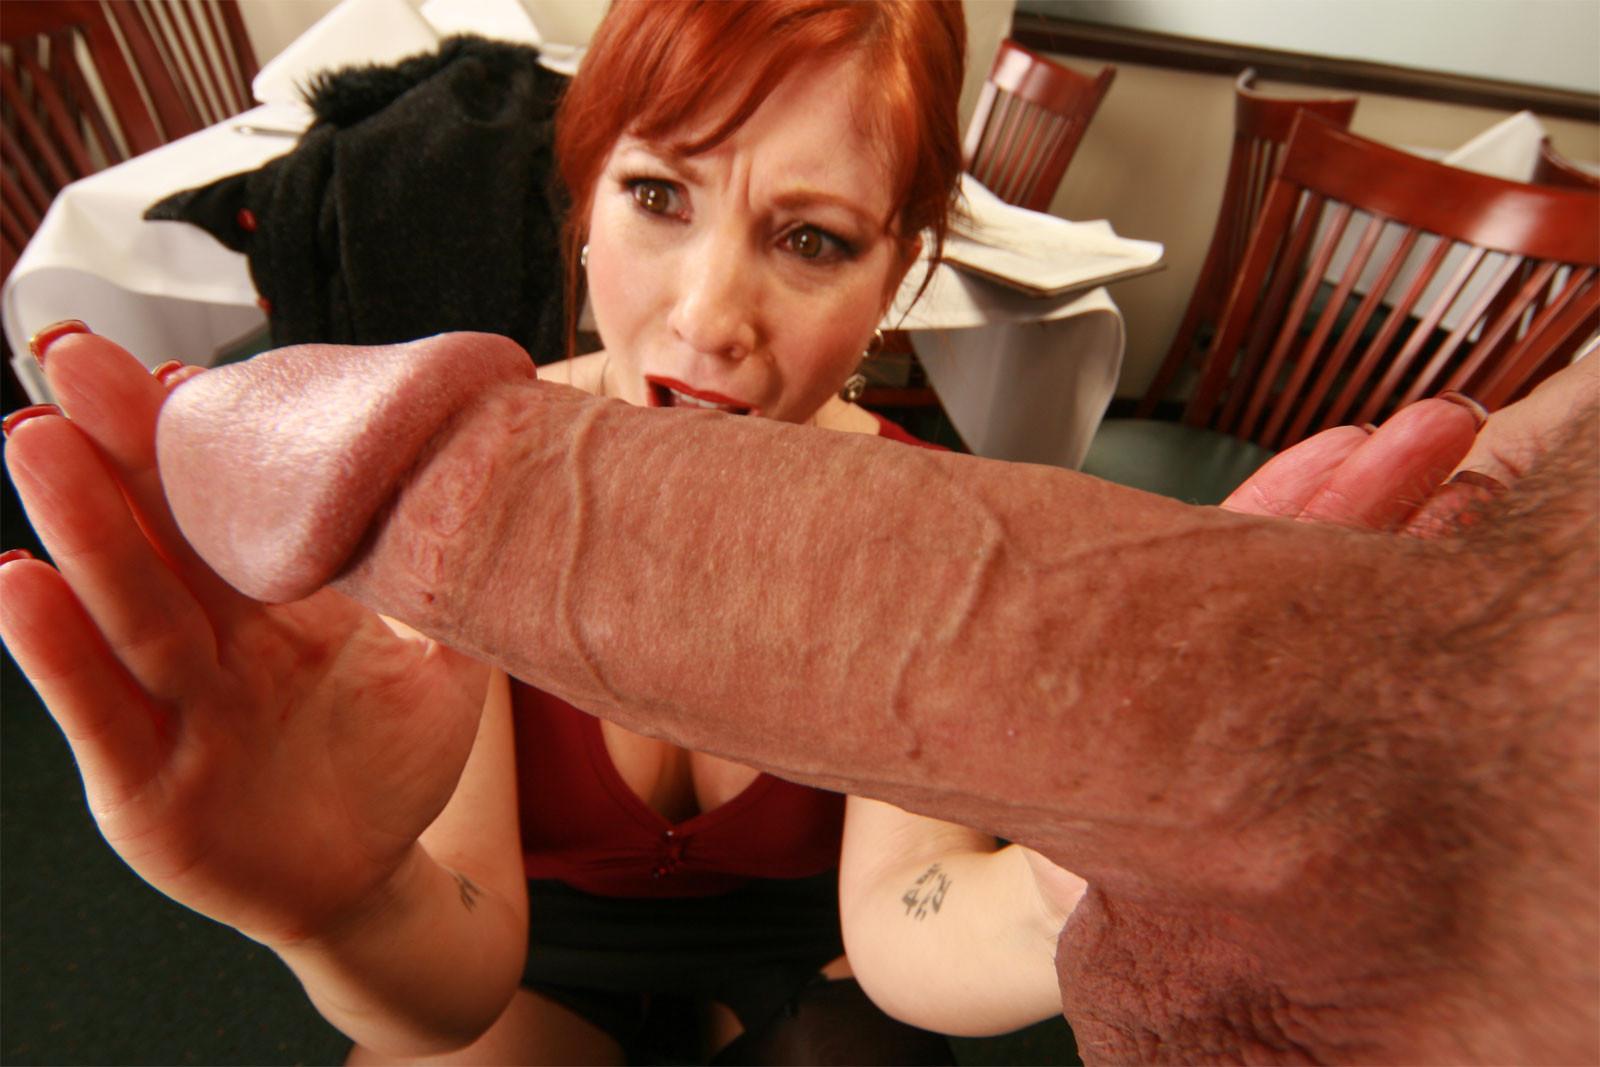 gallery-free-huge-cock-meat-checks-virgin-sexy